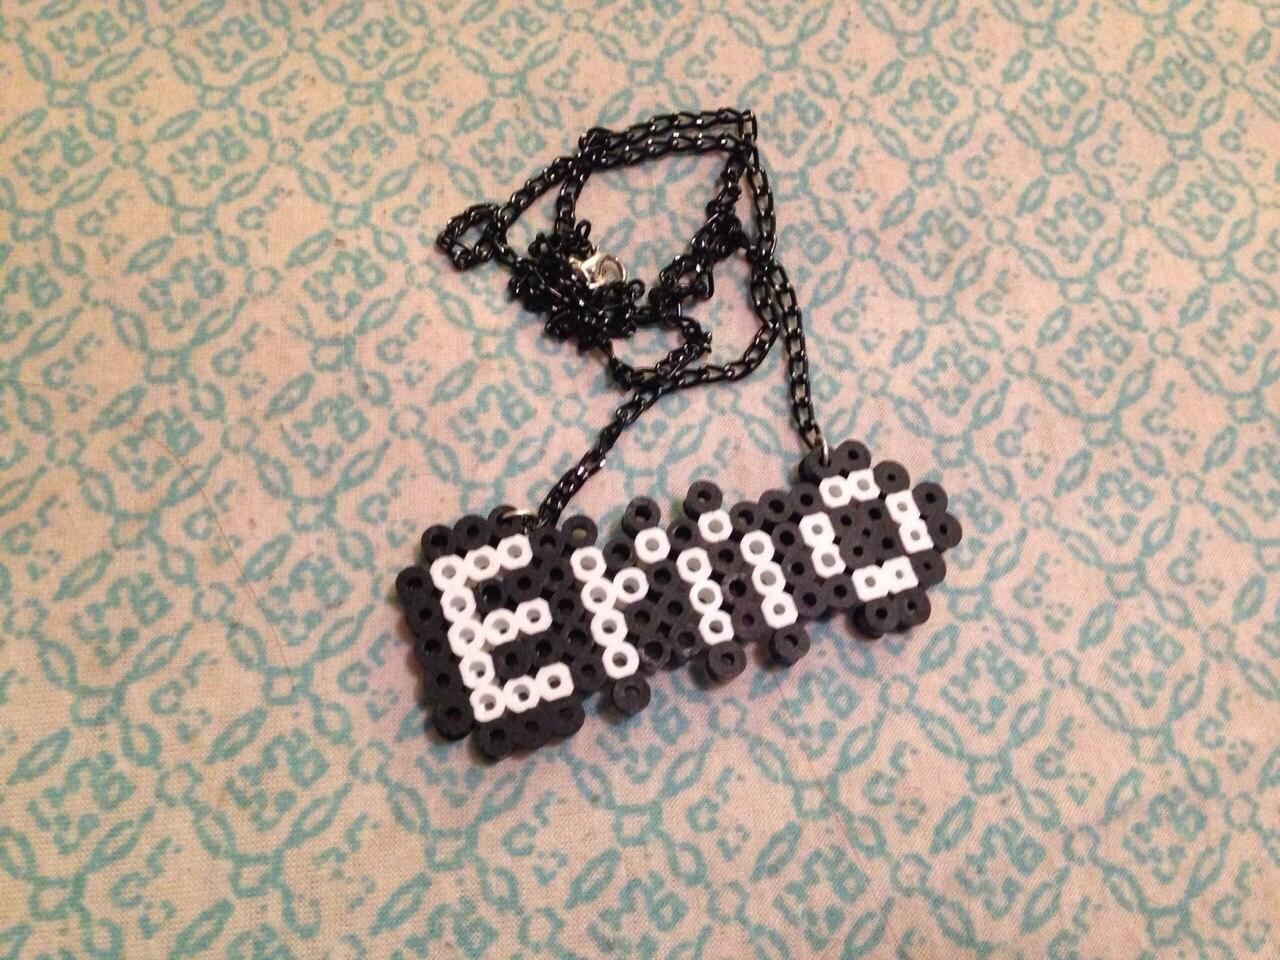 kawaii pixel perler bead necklace by fatkawaii on etsy